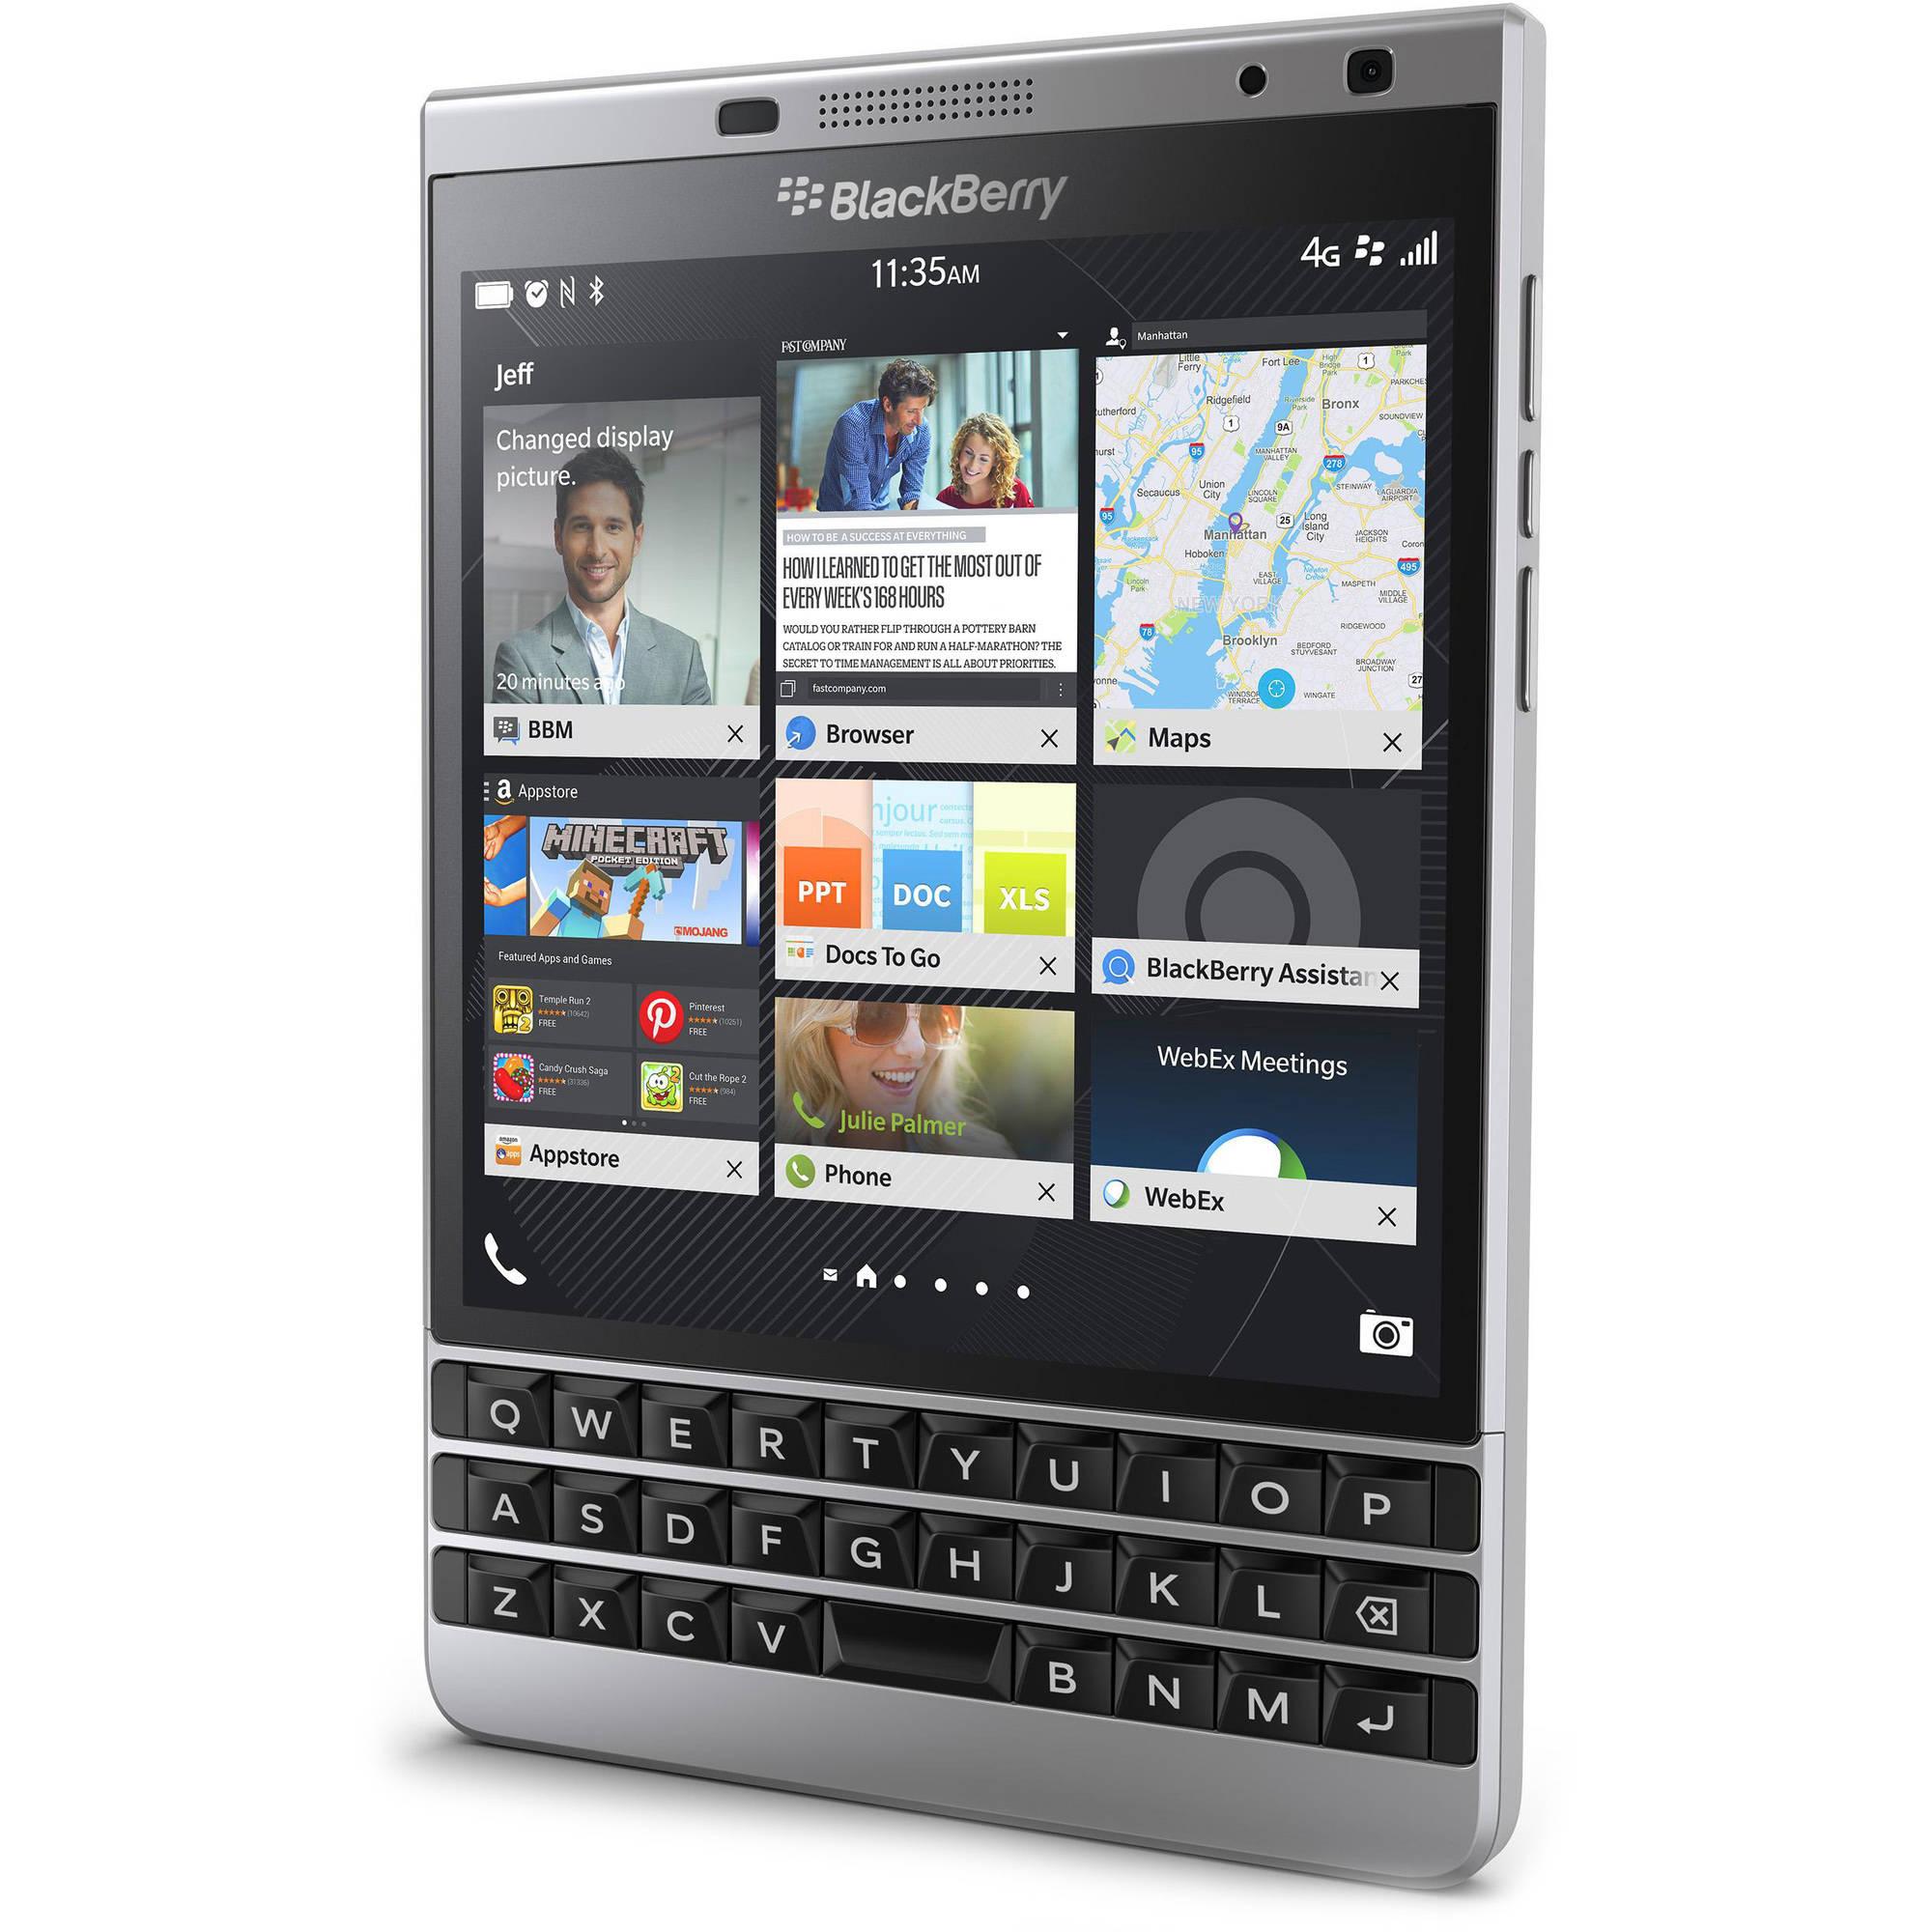 BlackBerry Passport SQW100-4 GSM Smartphone (Unlocked), Silver